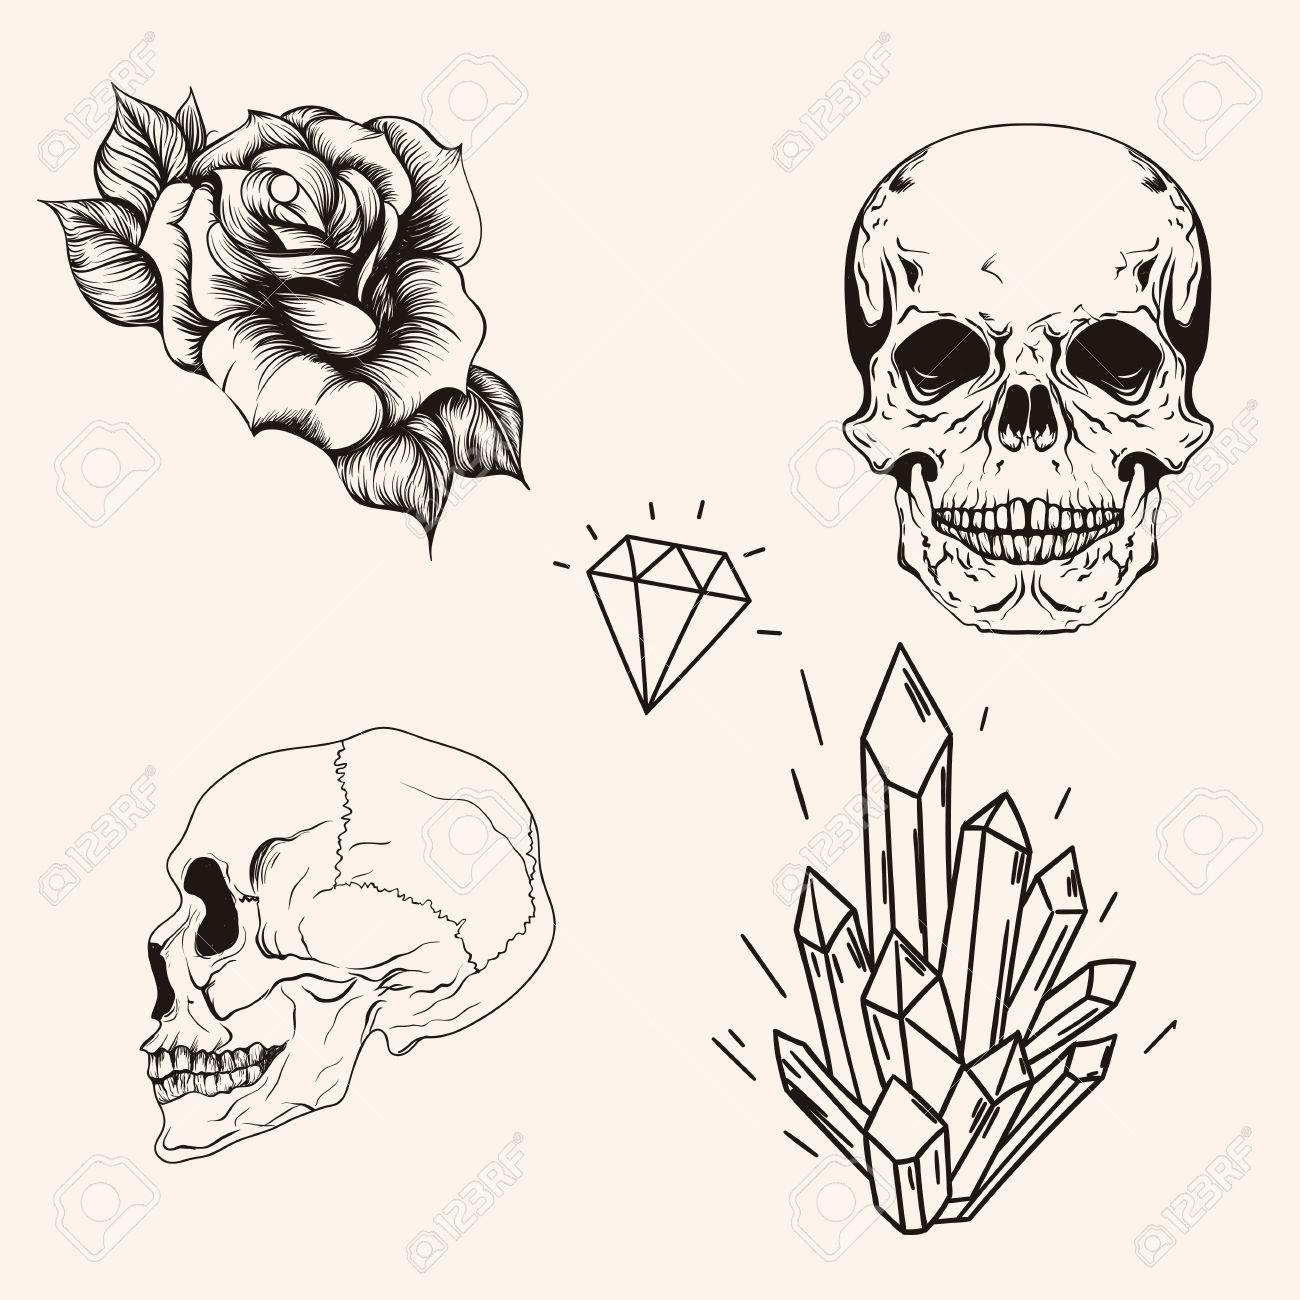 Dibujado A Mano Juego Scull Boceto Línea De Arte Del Tatuaje